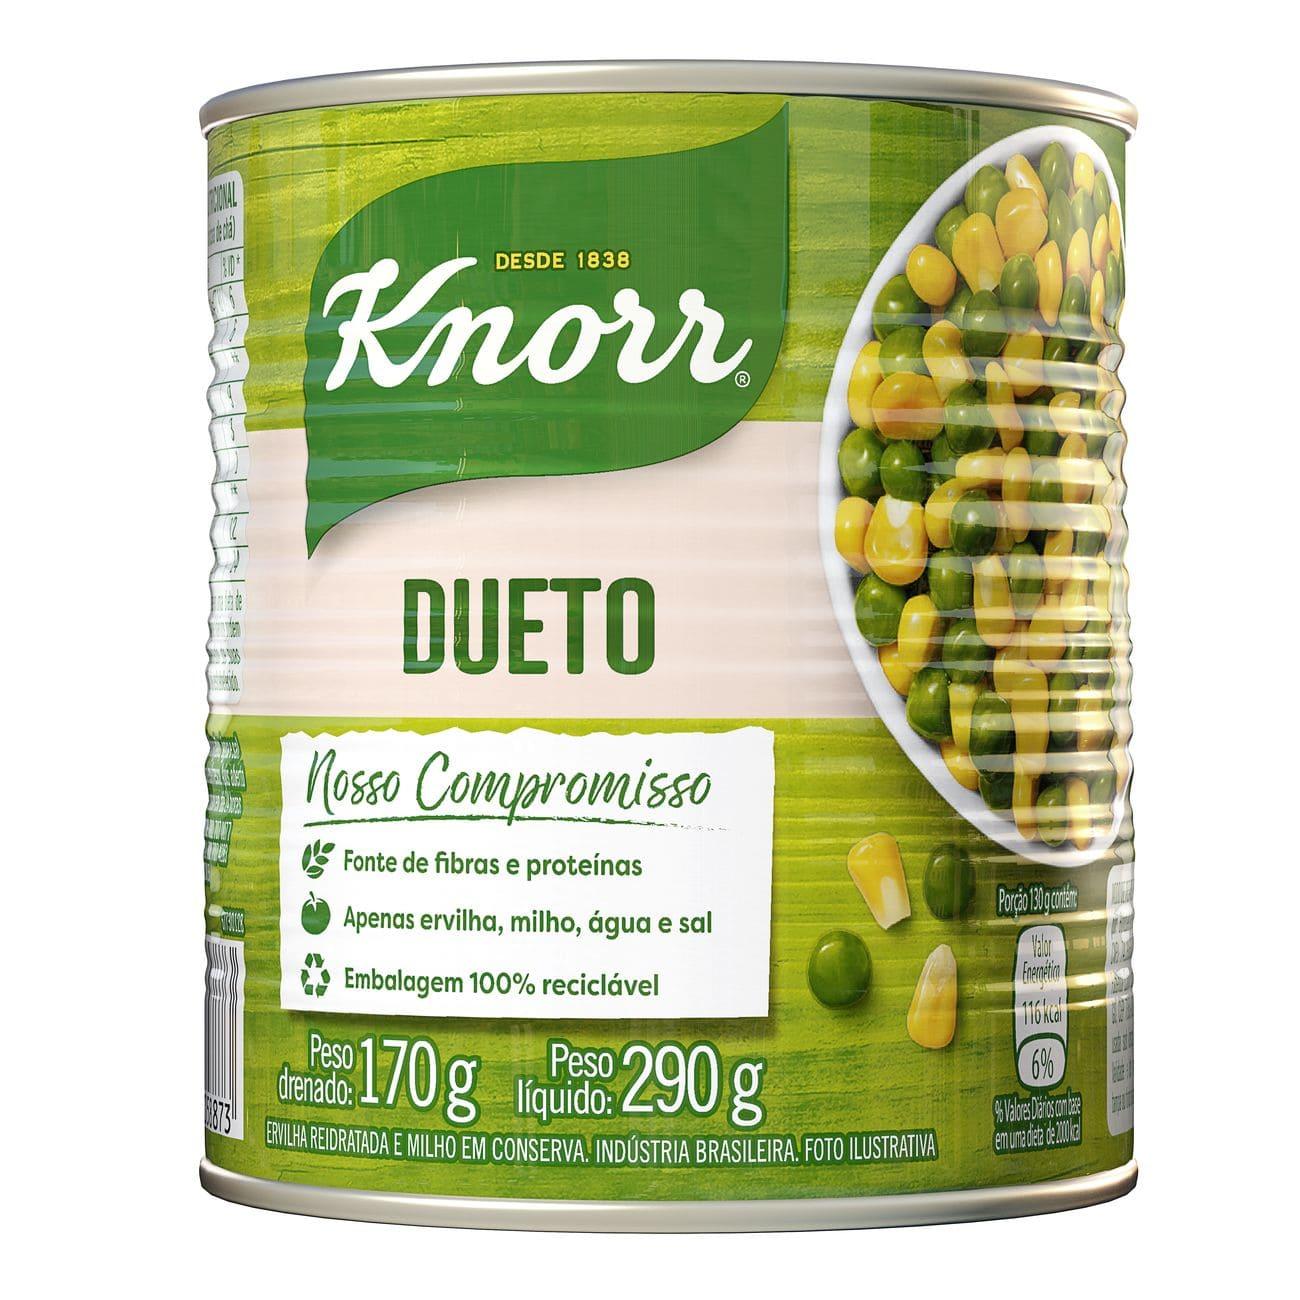 Dueto em Conserva Knorr 170g